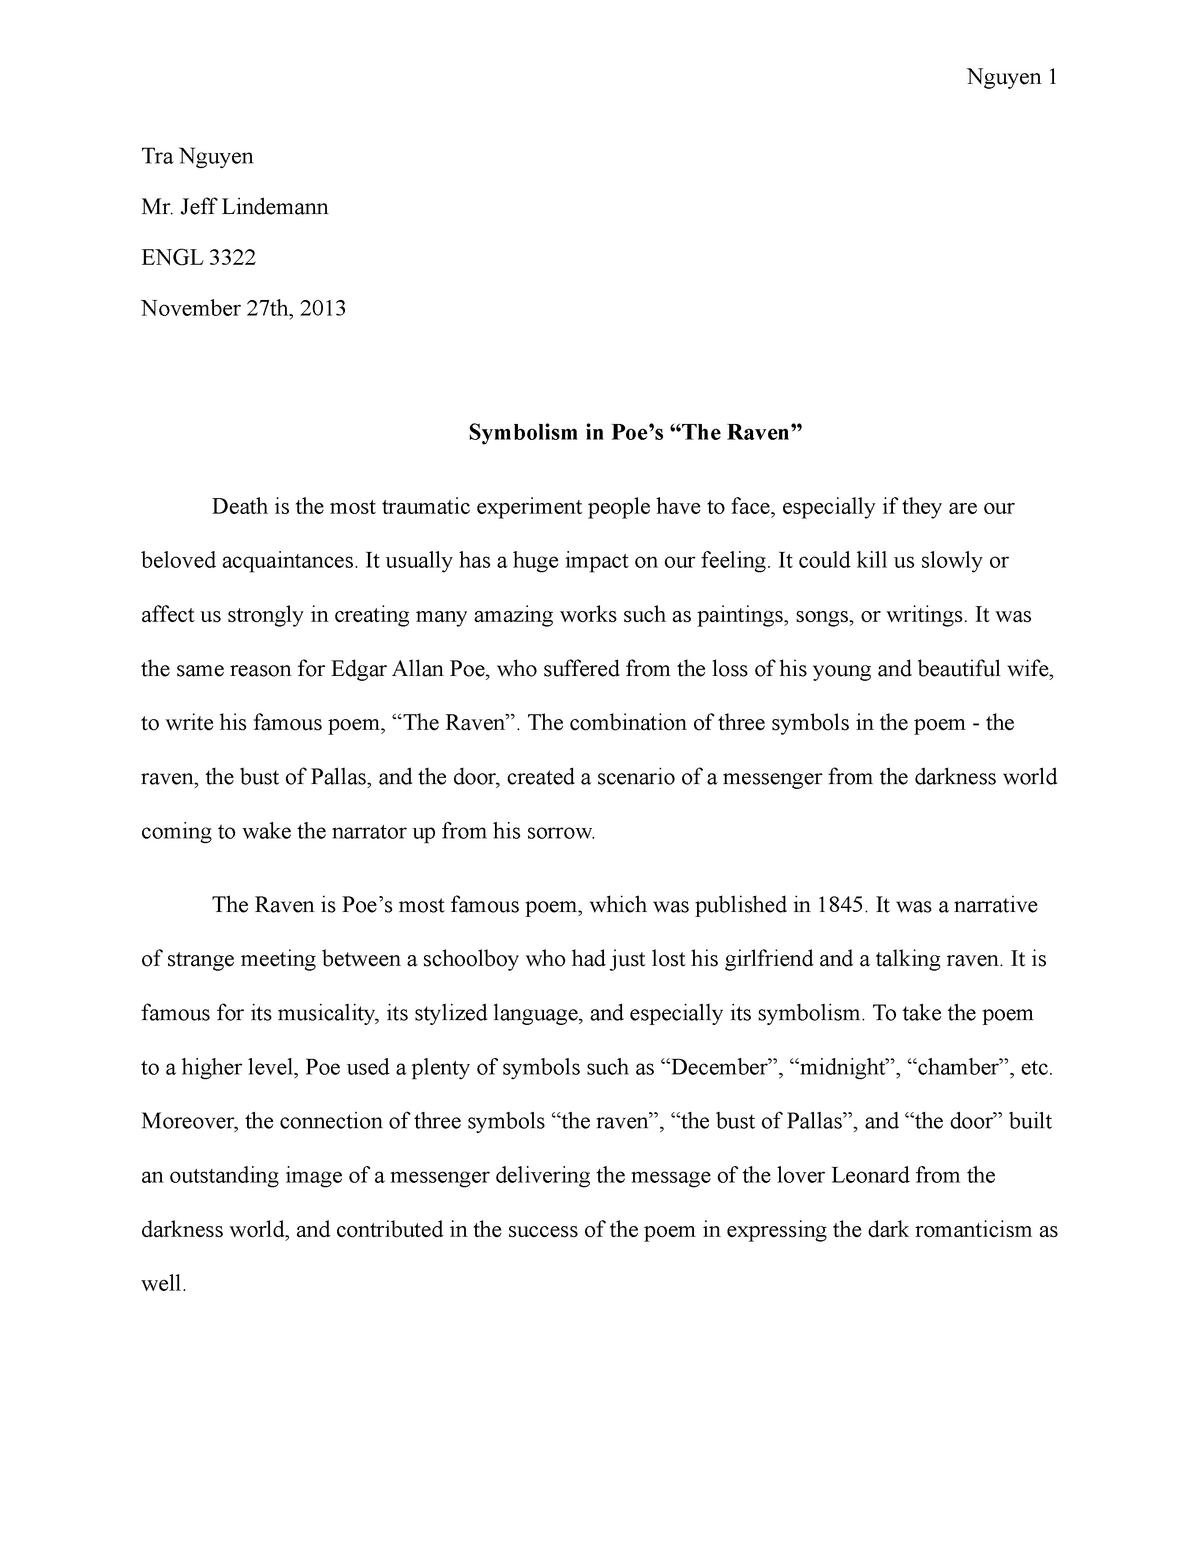 Essay 3 Grade A Eng 3322 Mexican American Literature